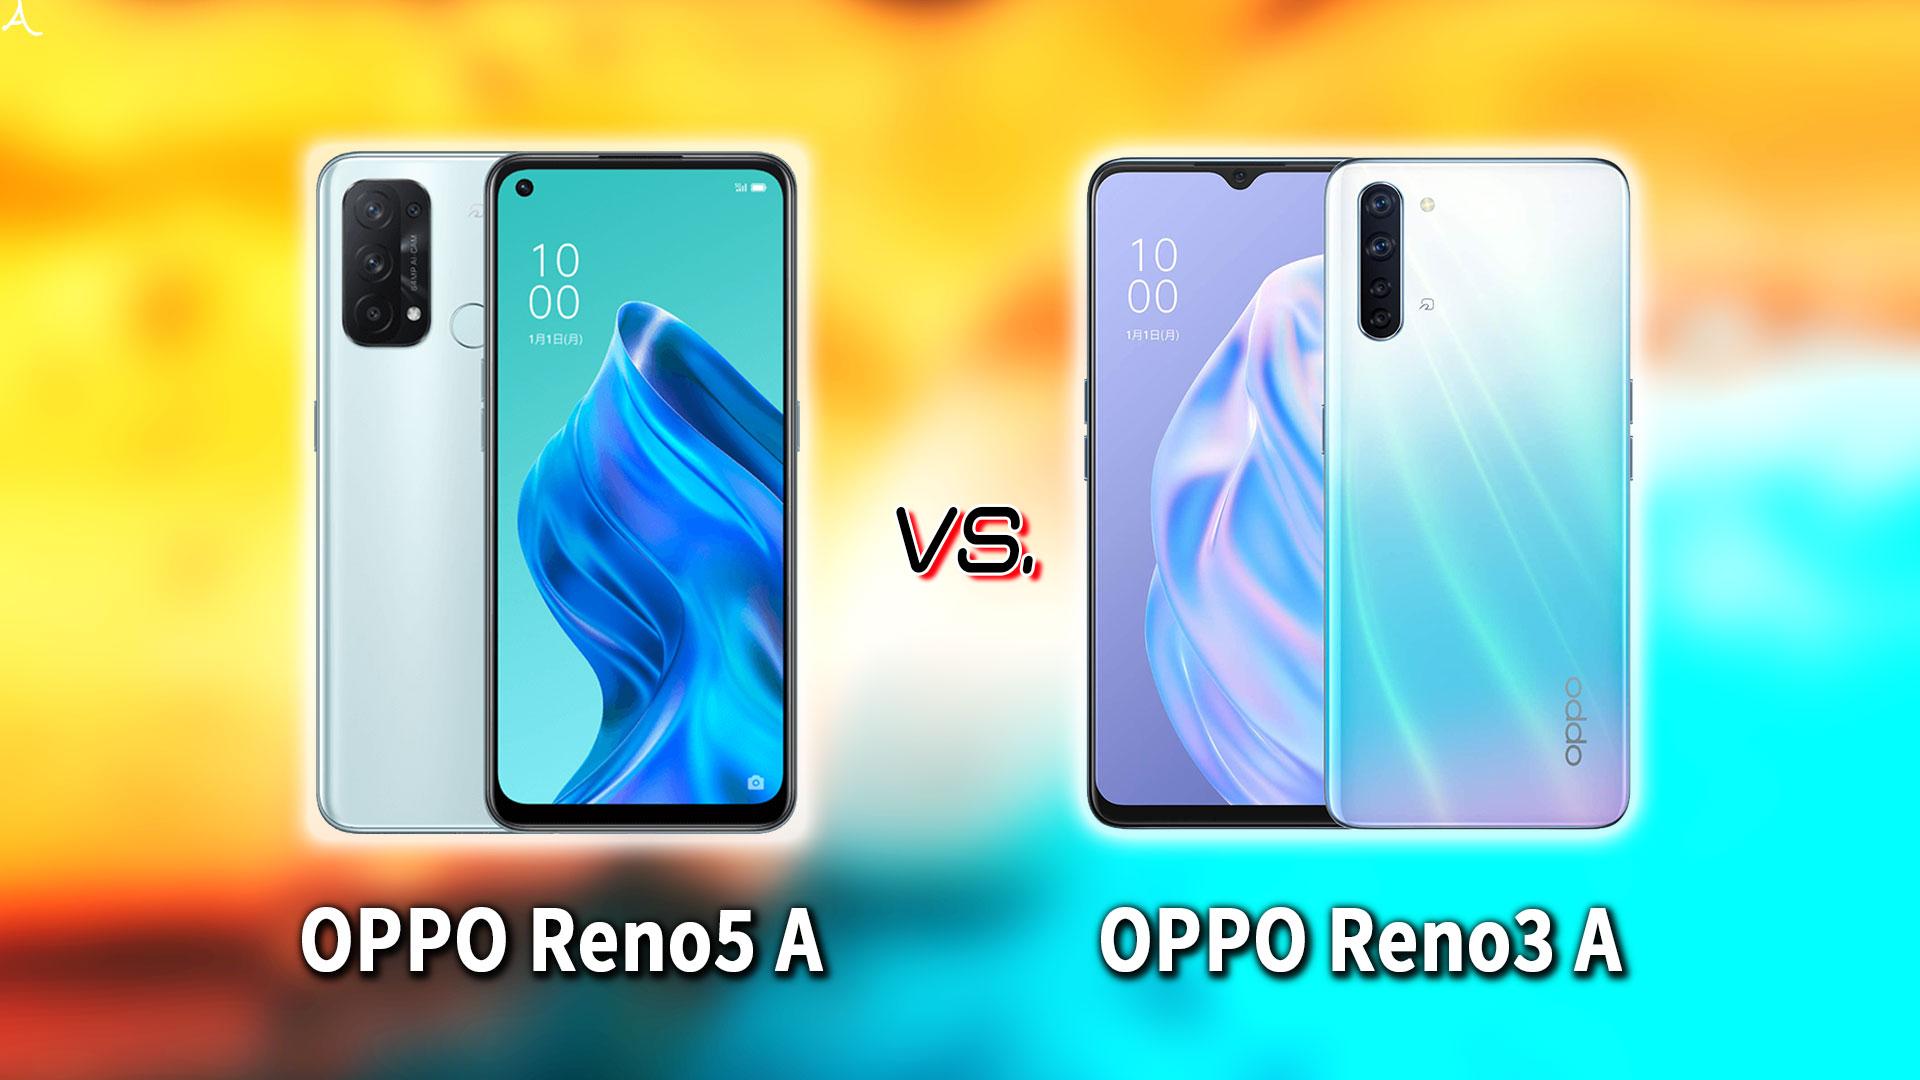 「OPPO Reno5 A」と「OPPO Reno3 A」の違いを比較:どっちを買う?